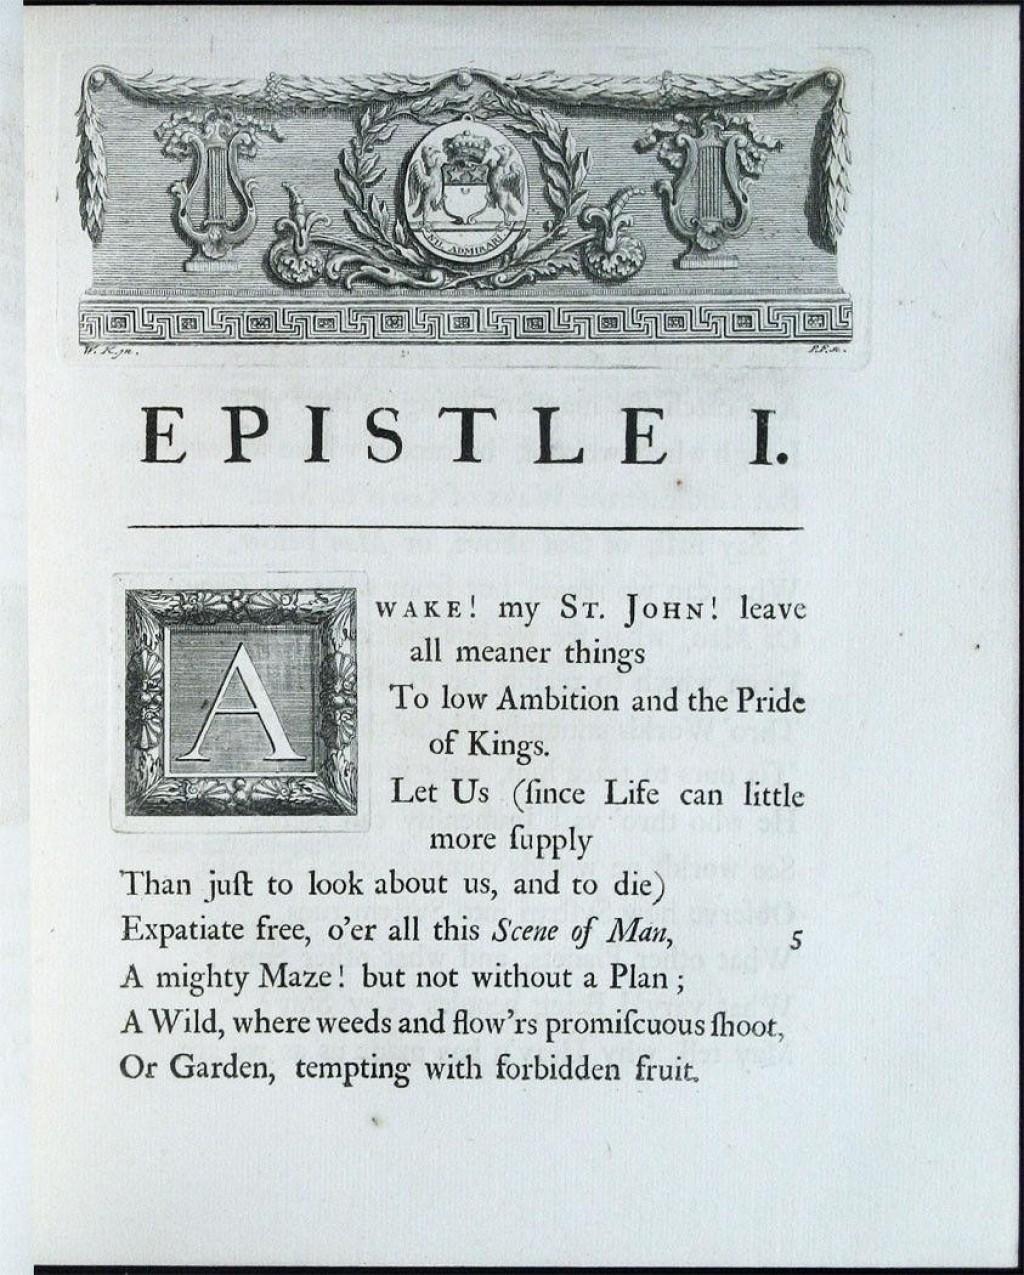 009 Essay Example Alexander Pope On Man 1734 1 E376706ec6b47f98a21b2d3c8e902d84 Dreaded Summary Epistle 2 Pdf Large